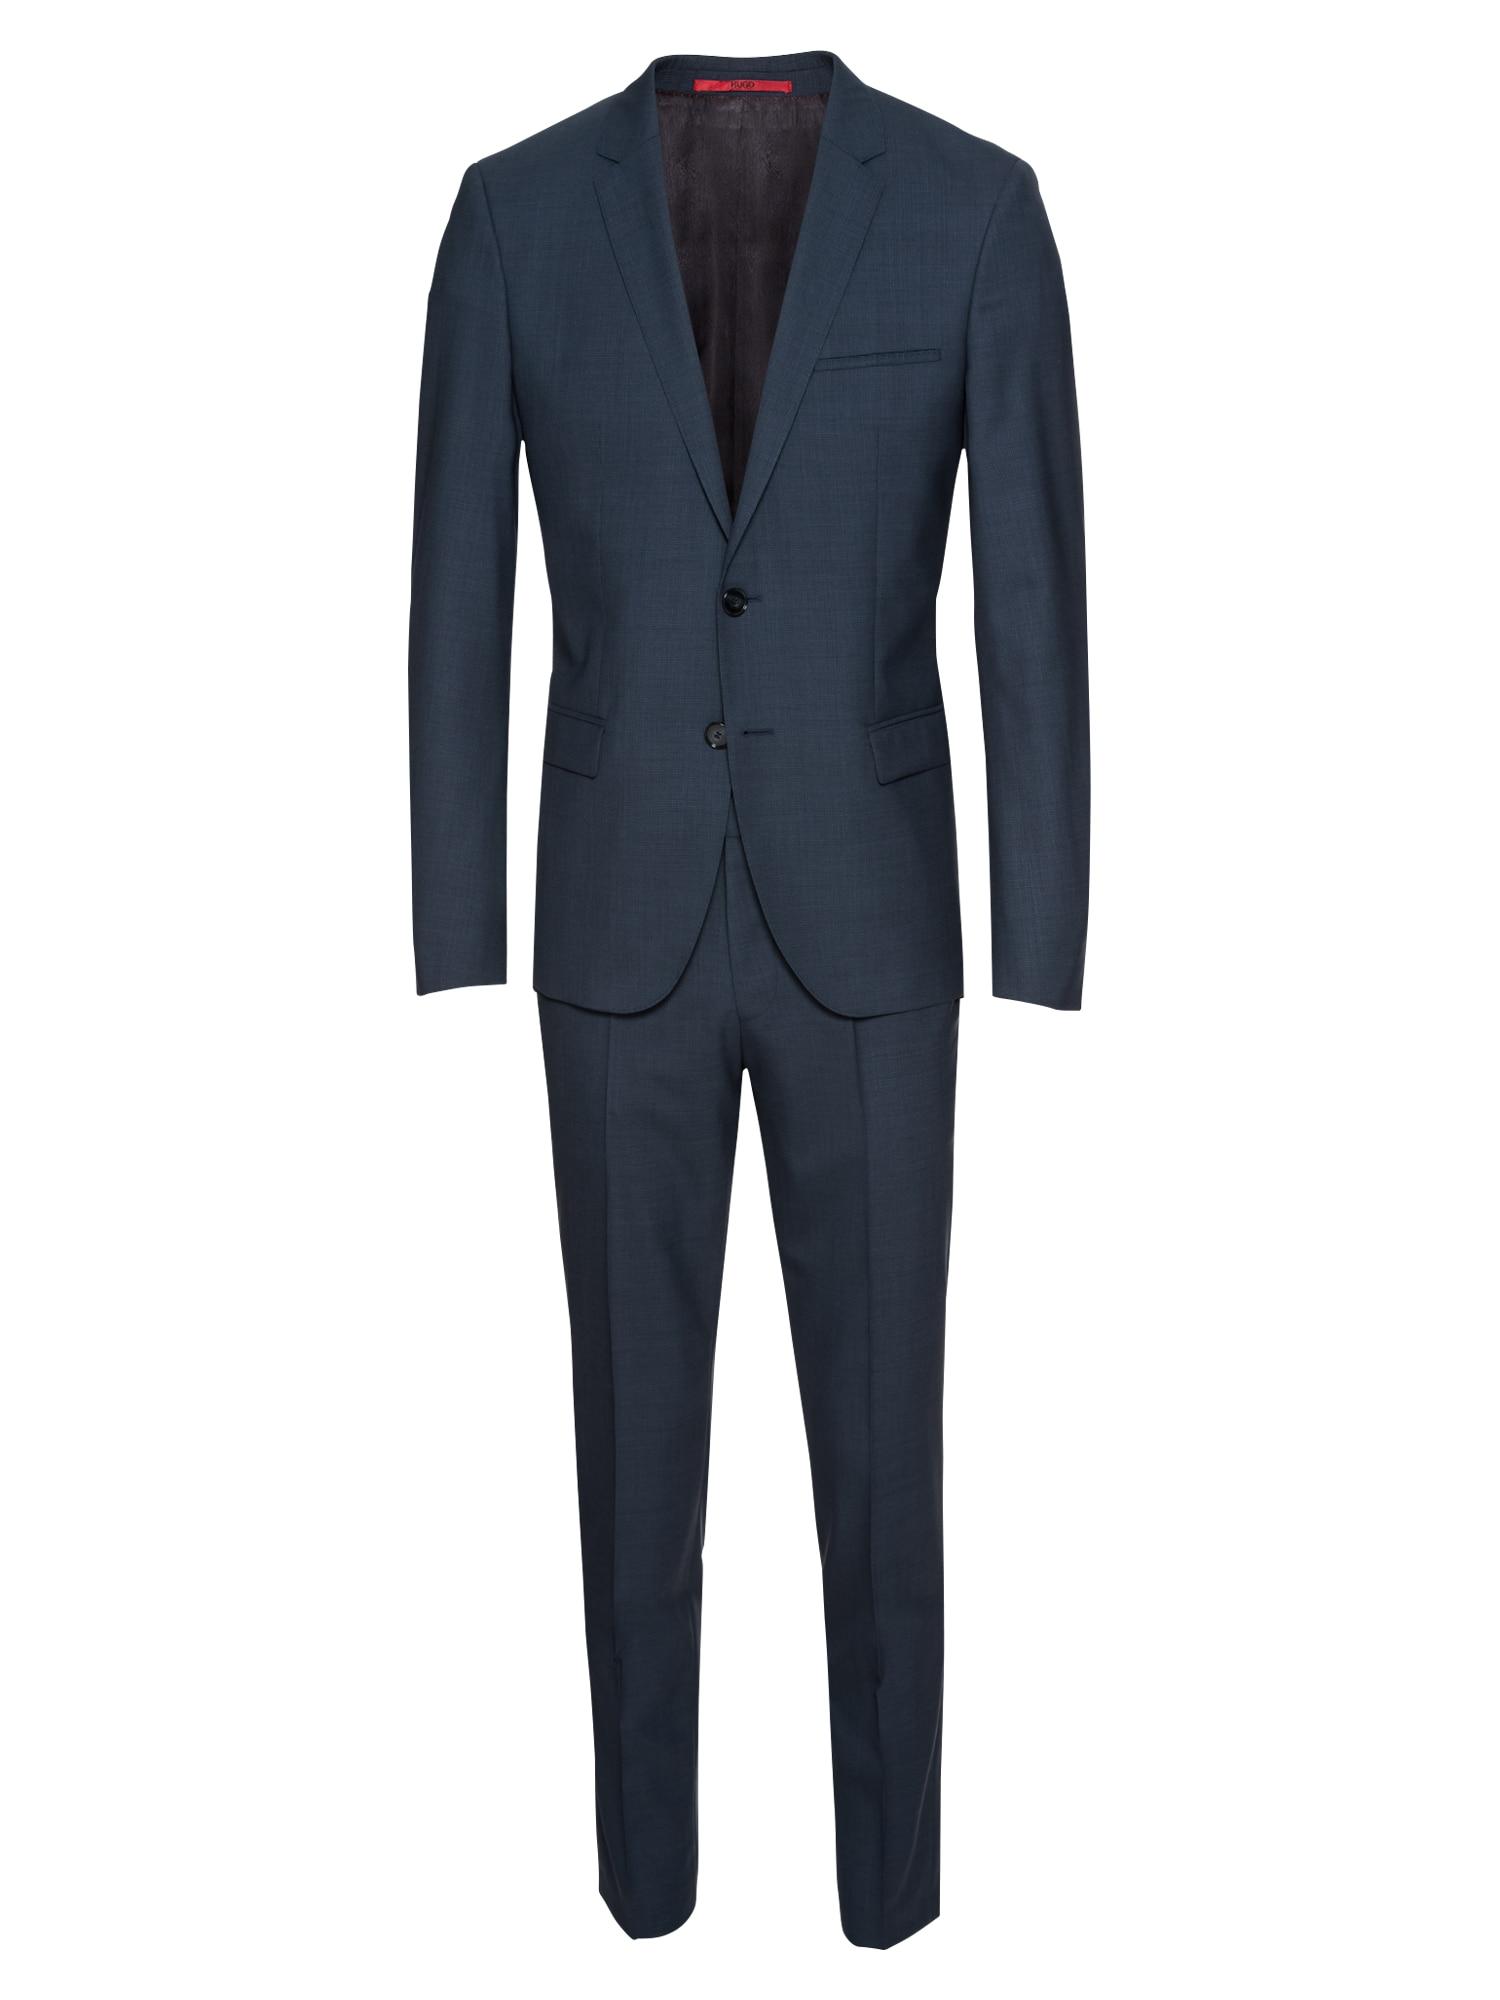 Oblek ArtiHesten182 10207492 01 námořnická modř HUGO